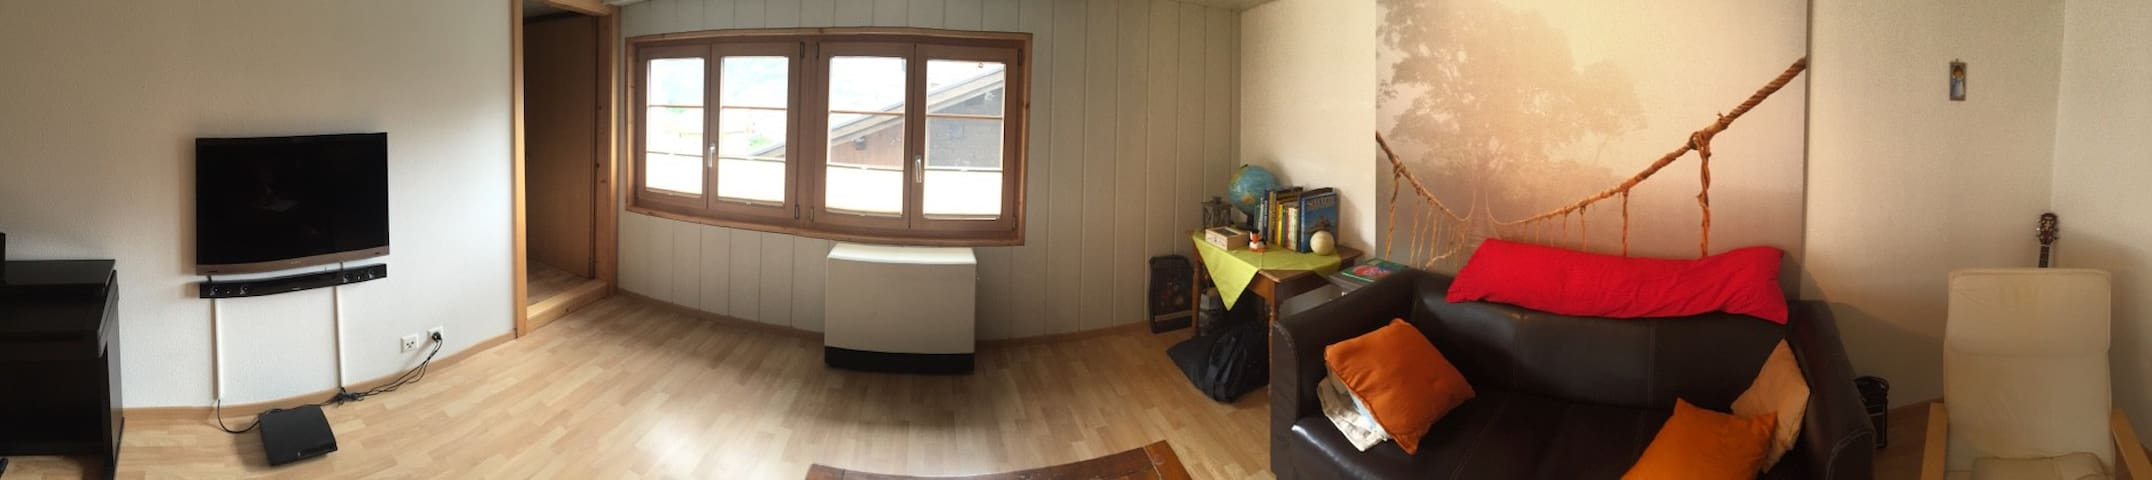 Cosy apartment in old village part - Steg-Hohtenn - Apartamento